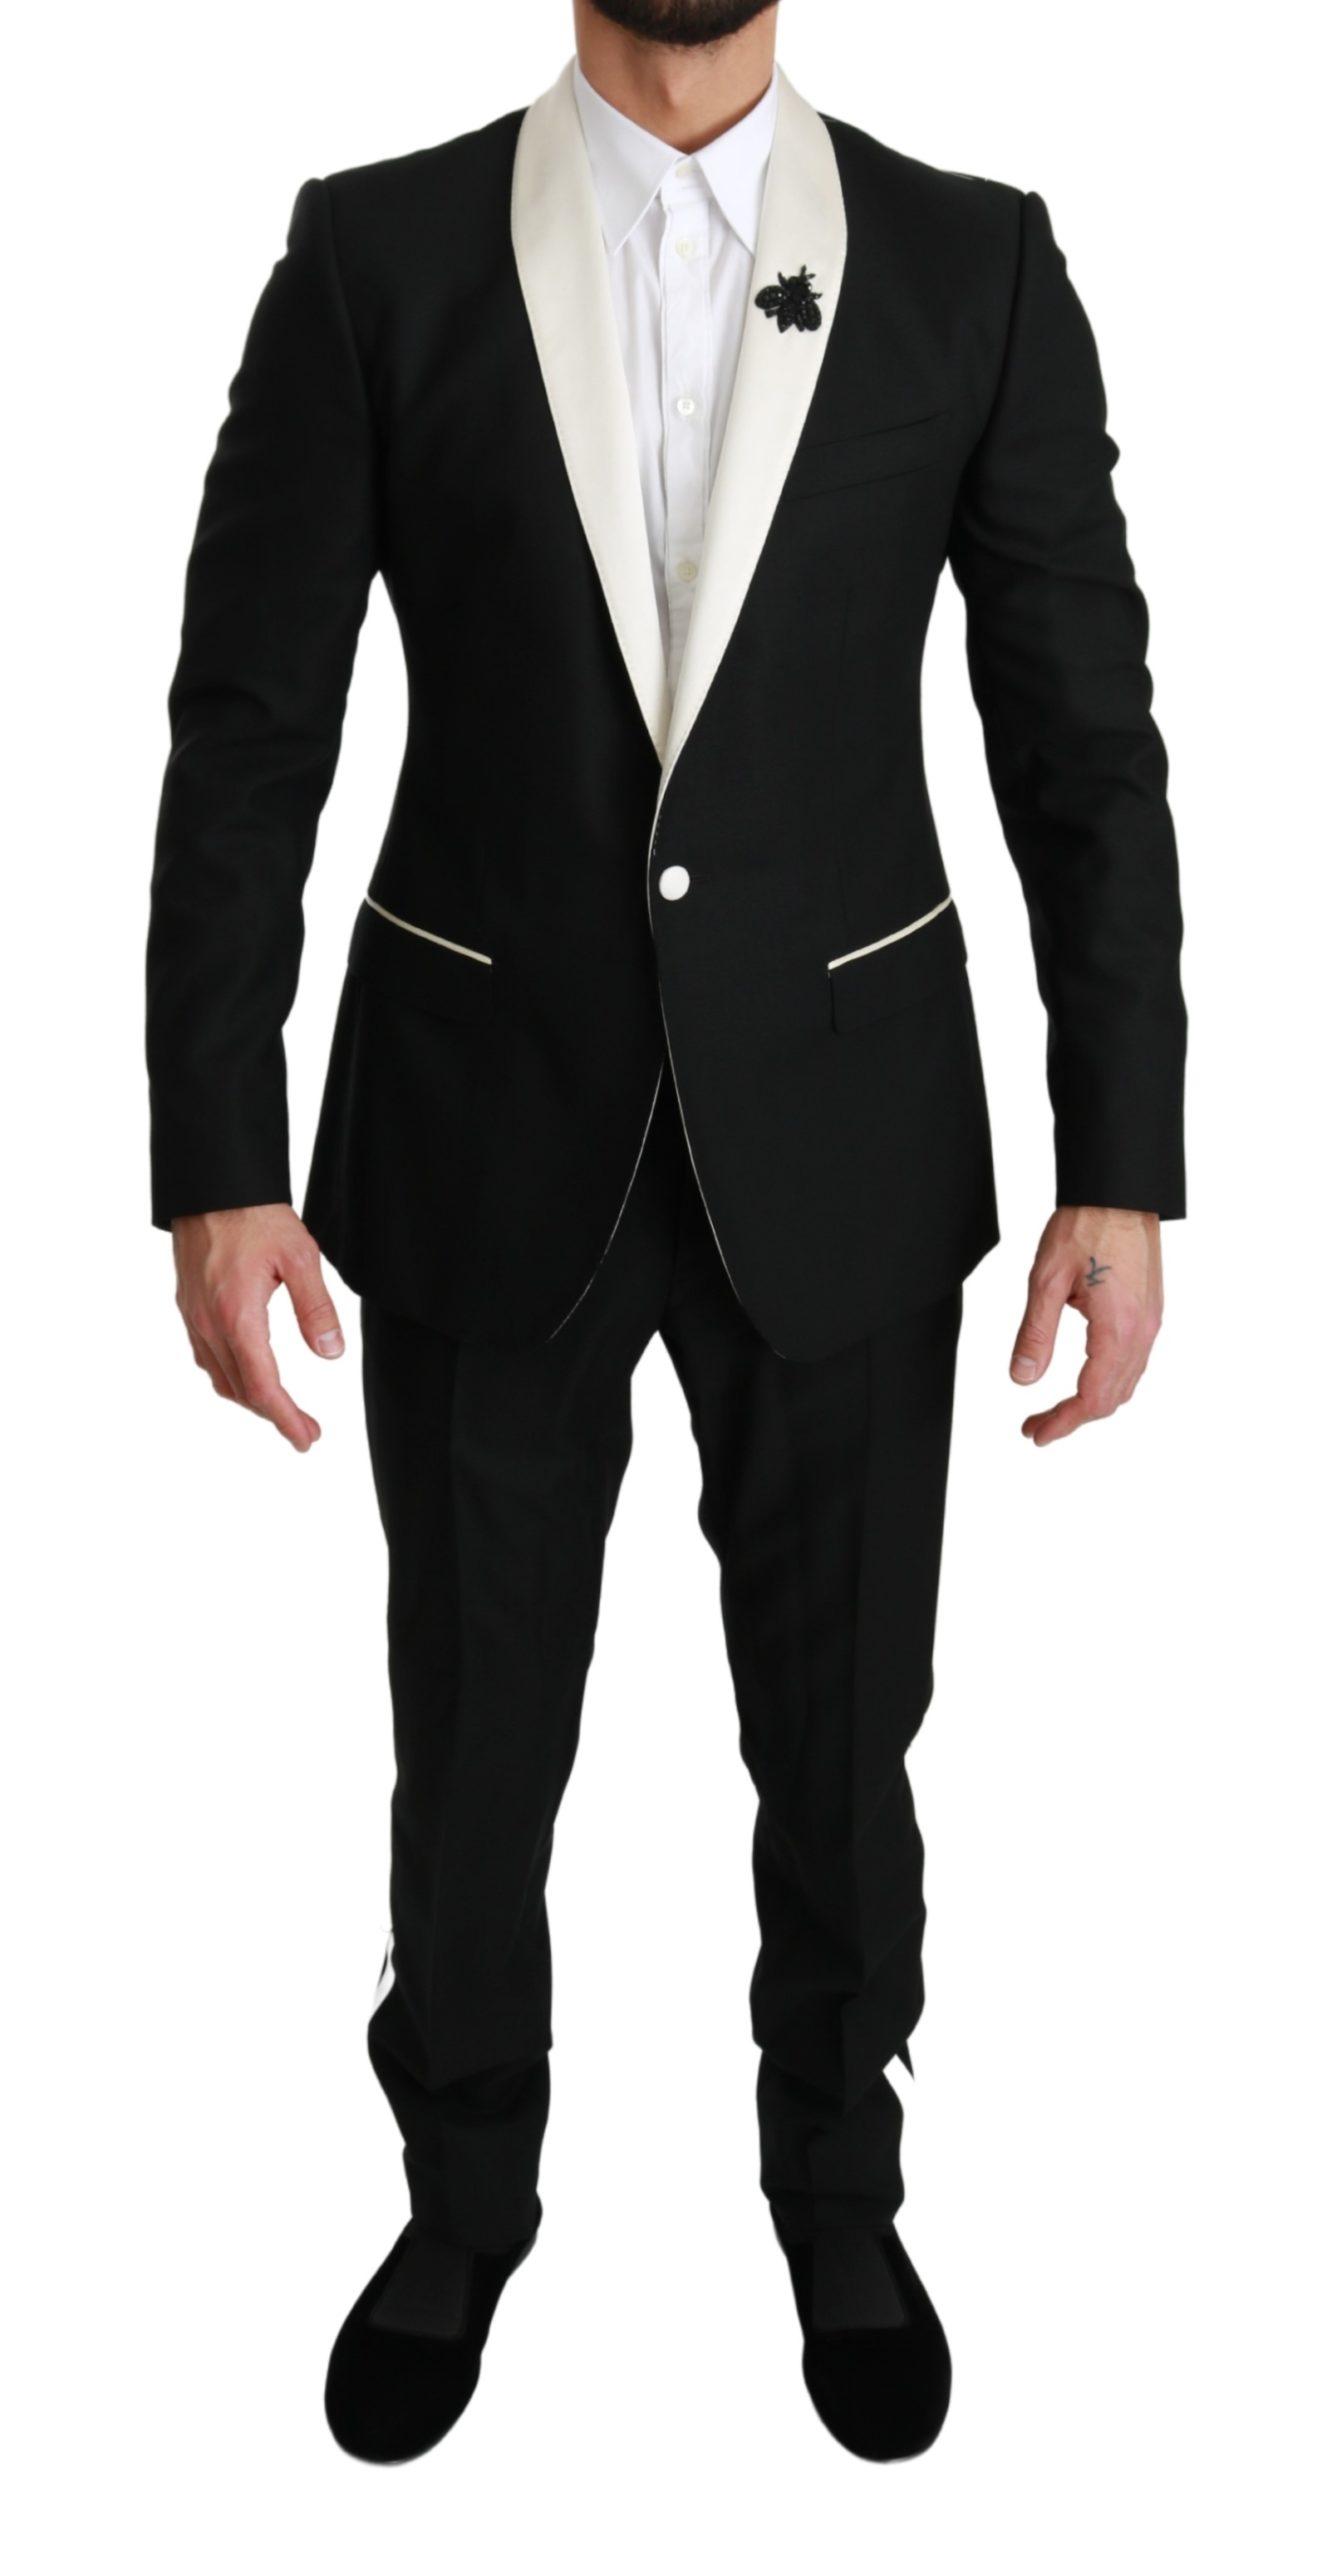 Dolce & Gabbana Men's Wool Royal Bee 2 Piece MARTINI Suit Black KOS1672 - IT48 | M